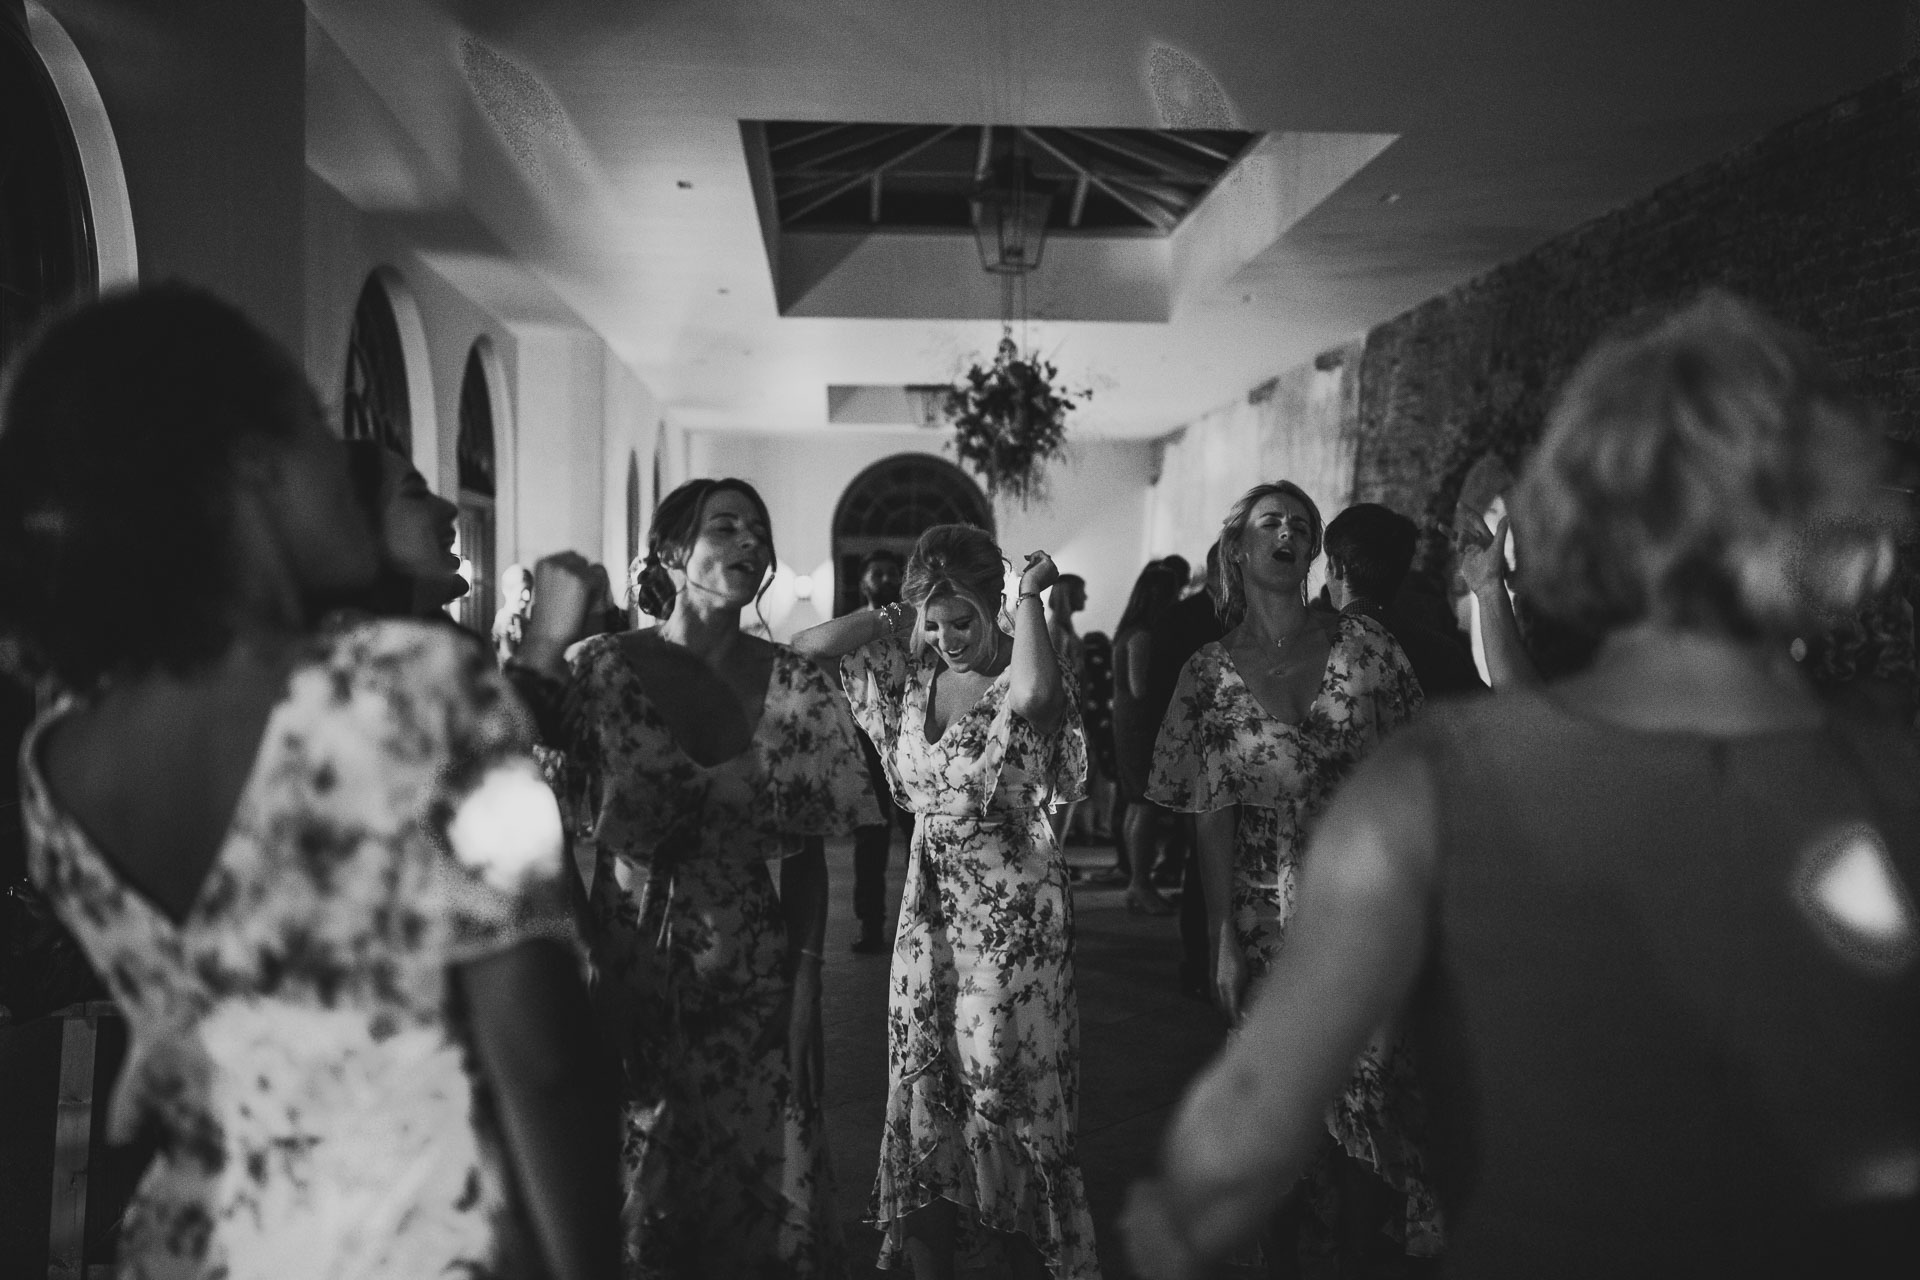 middleton_lodge_wedding_photographer-124.jpg